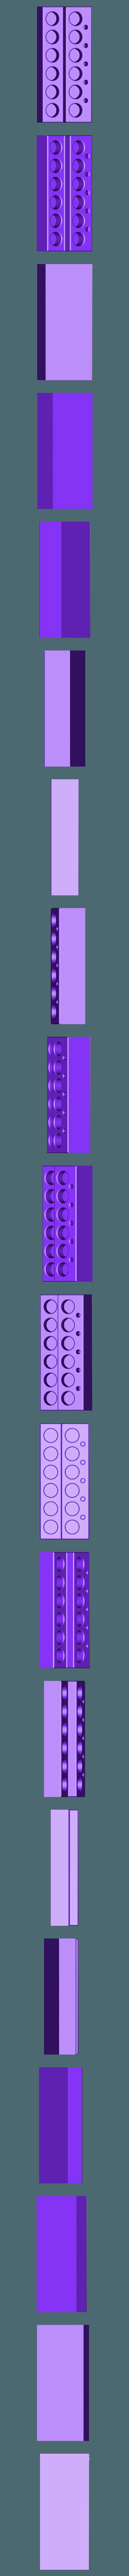 Base.STL Download free STL file suppoert paint pot model paint pot • 3D print design, alaingiresini